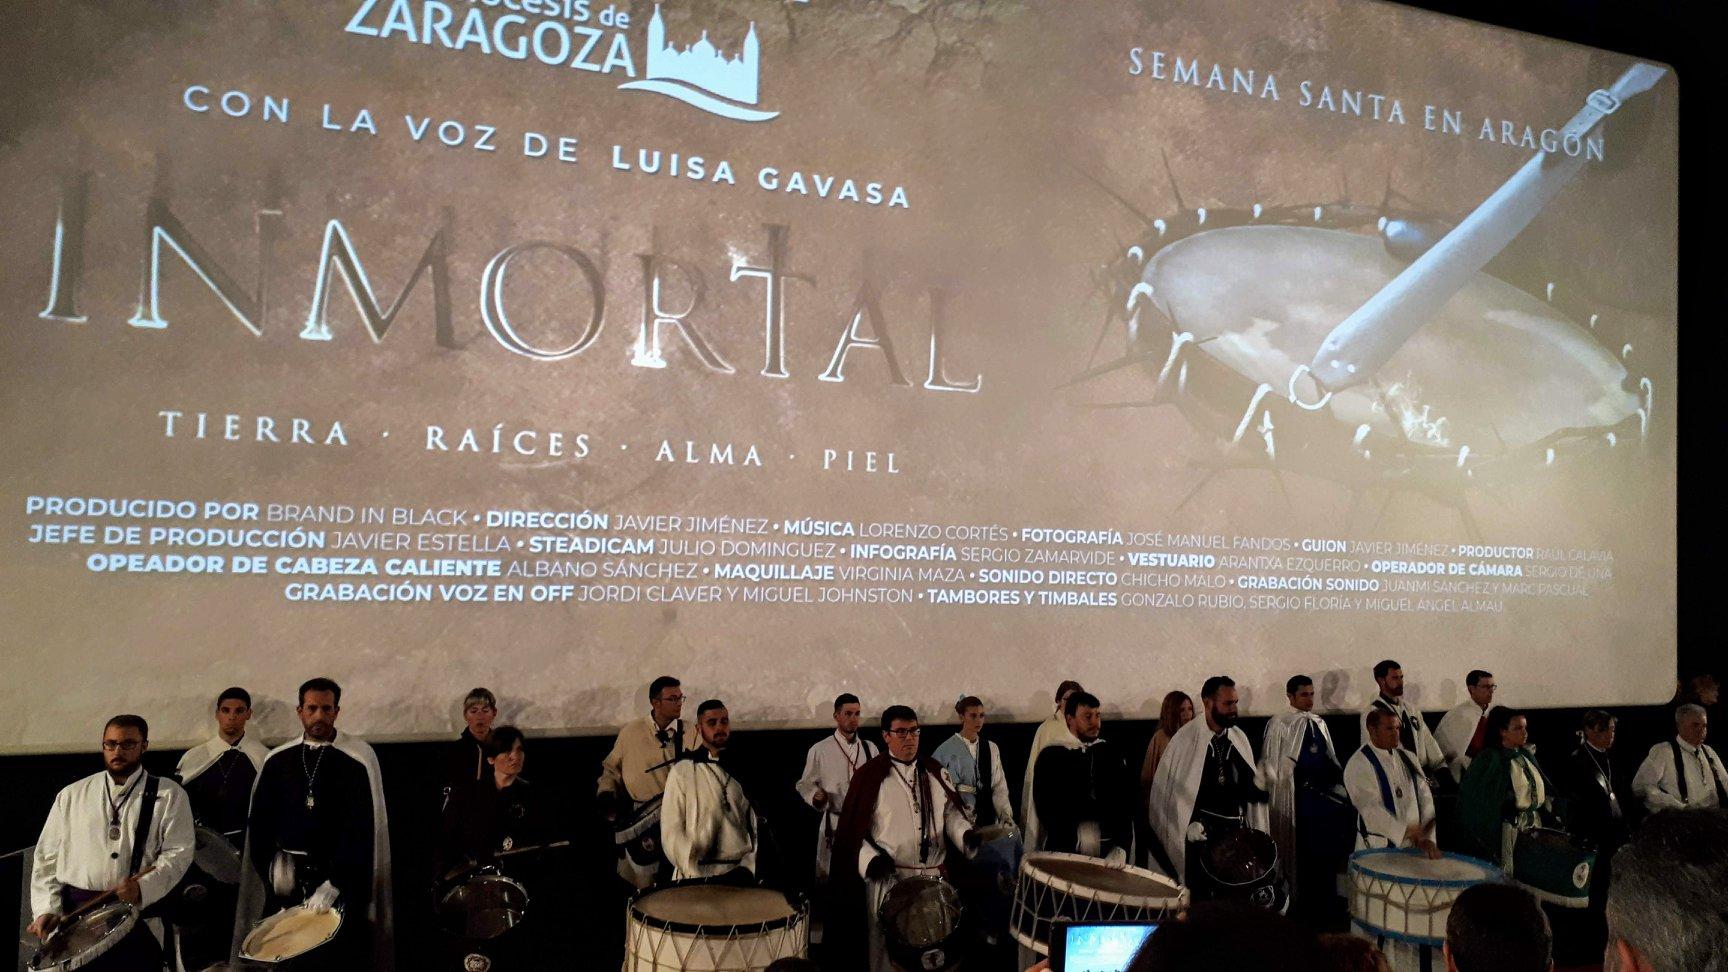 Inmortal release in Palafox Cinema